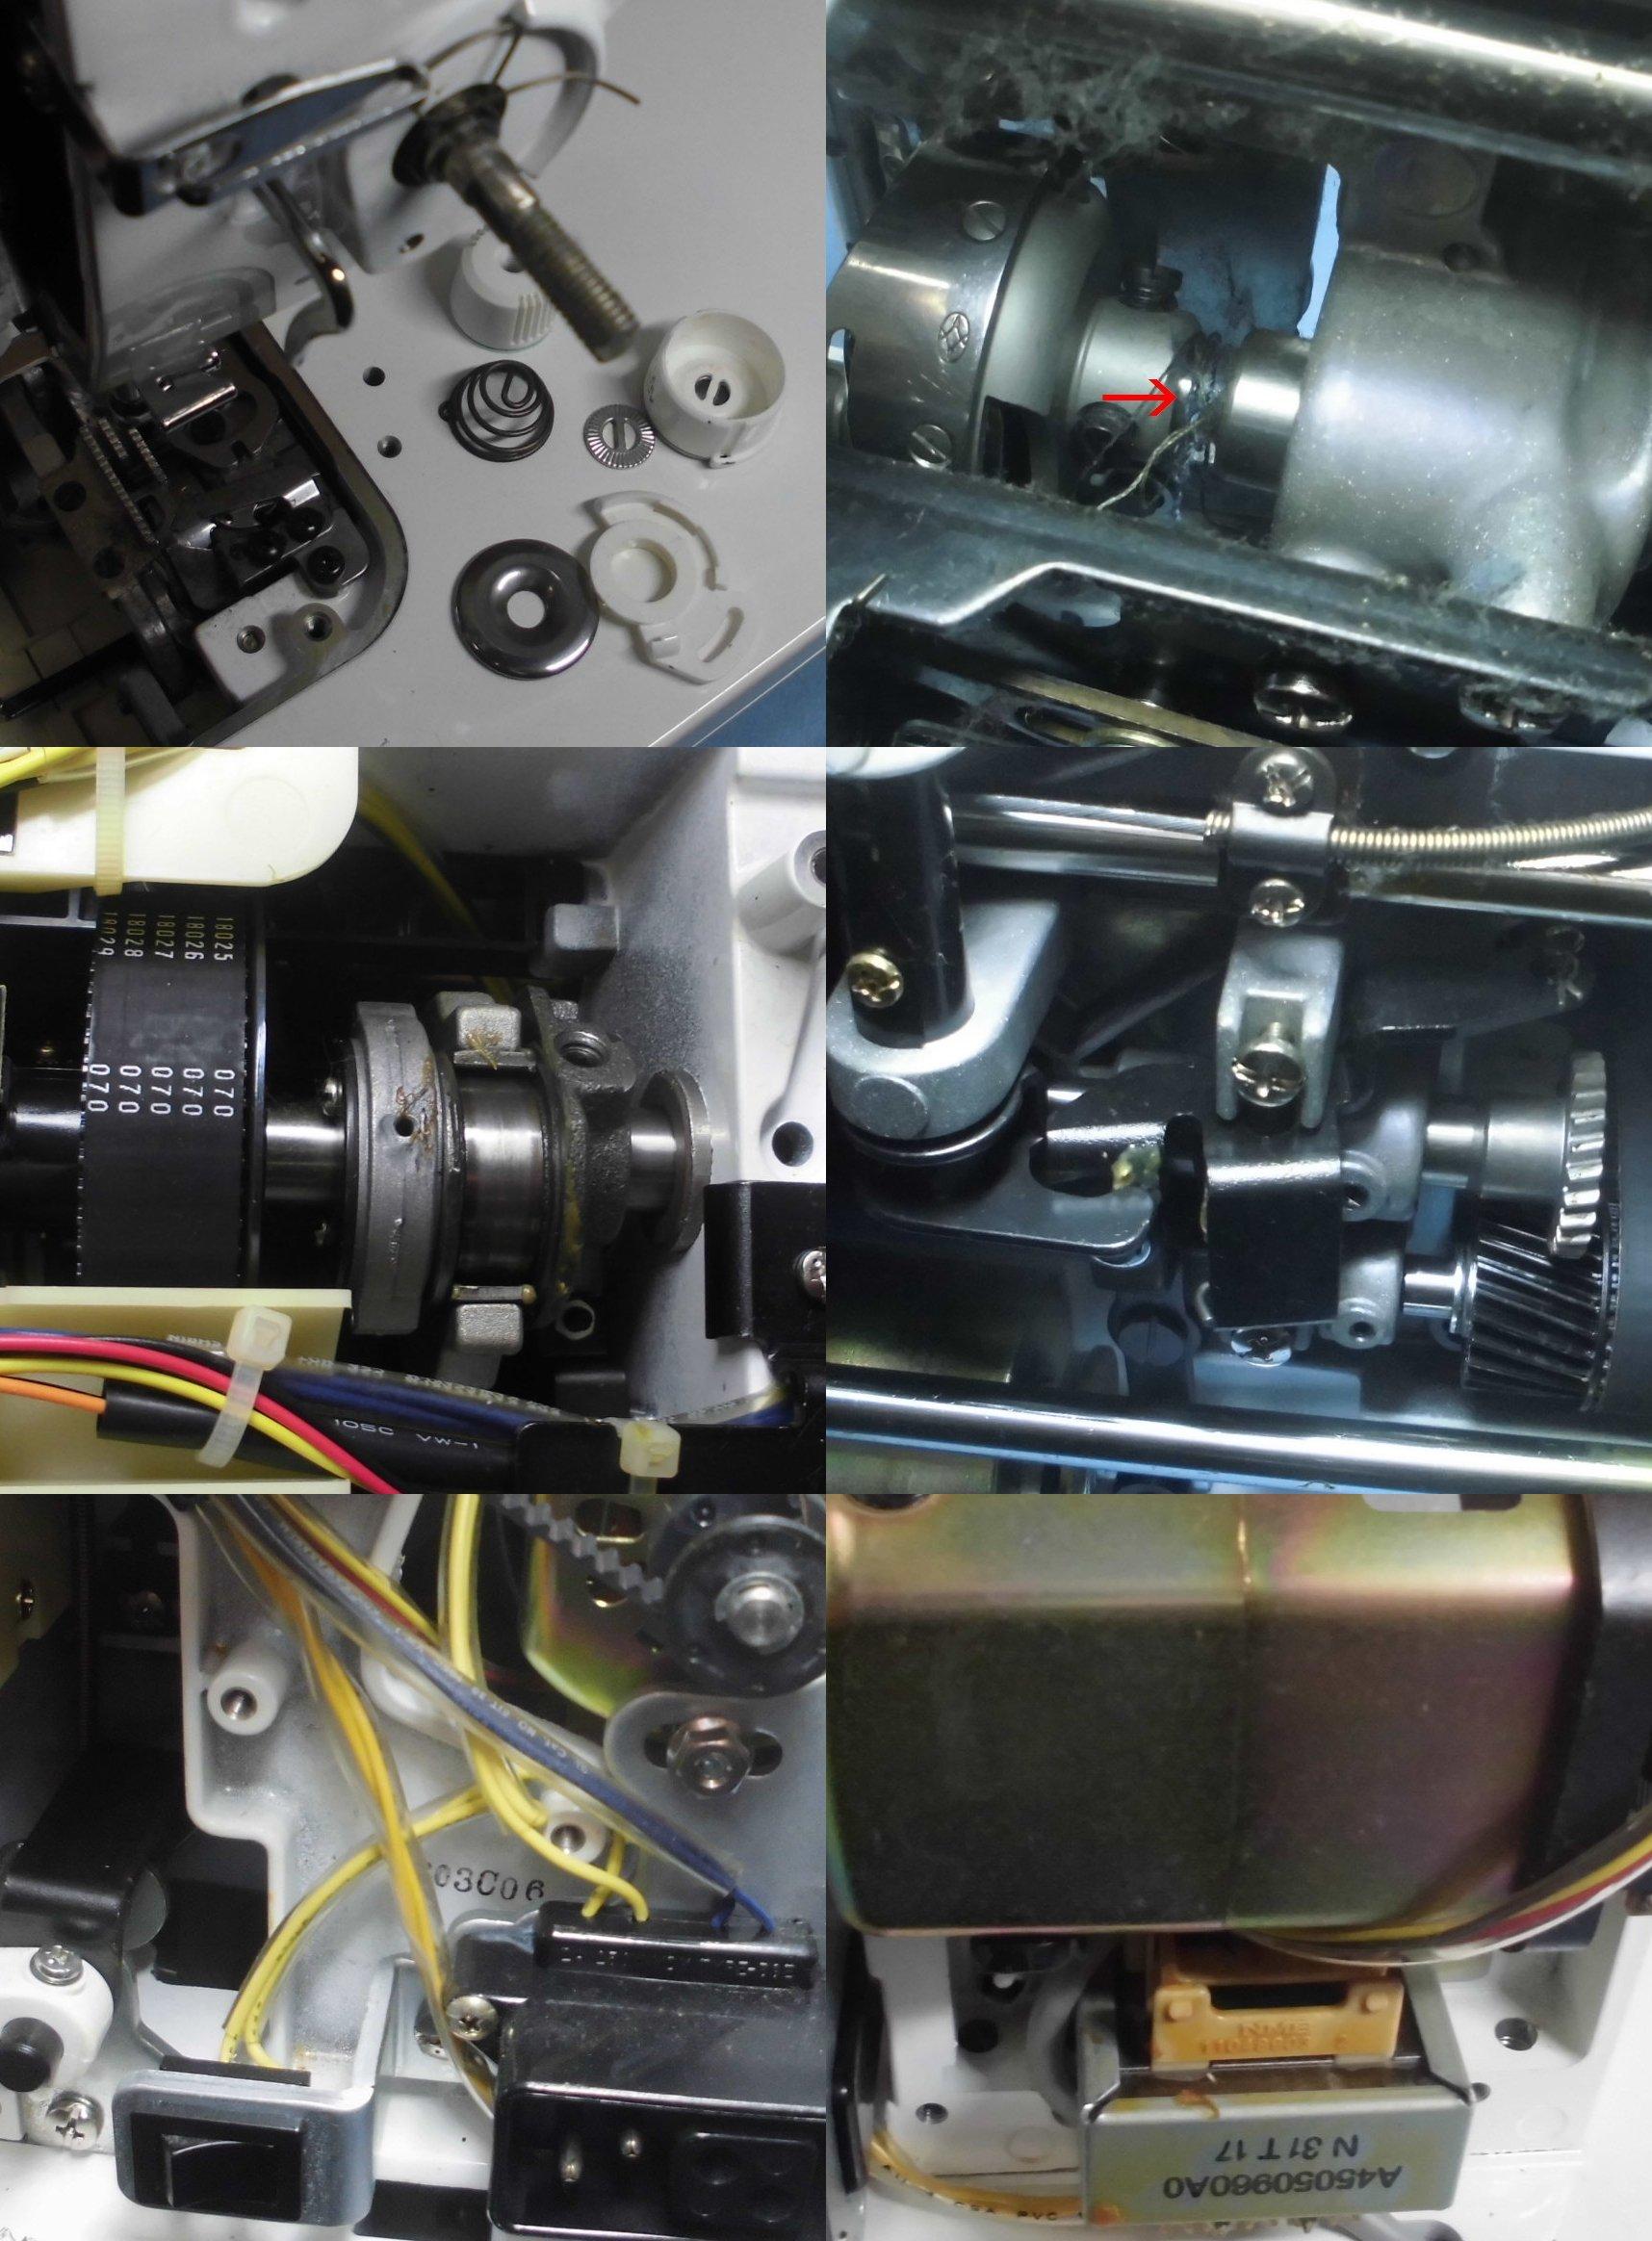 JUKIミシン SPUR98specialの全体オーバーホールメンテナンス修理|TL-98SP